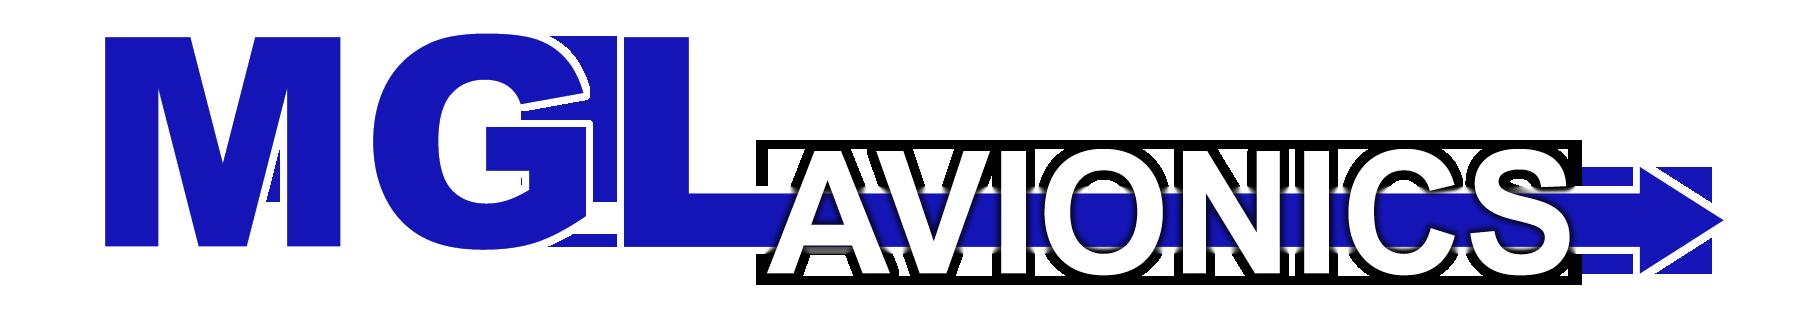 MGL Avionics Logo high res copy 1